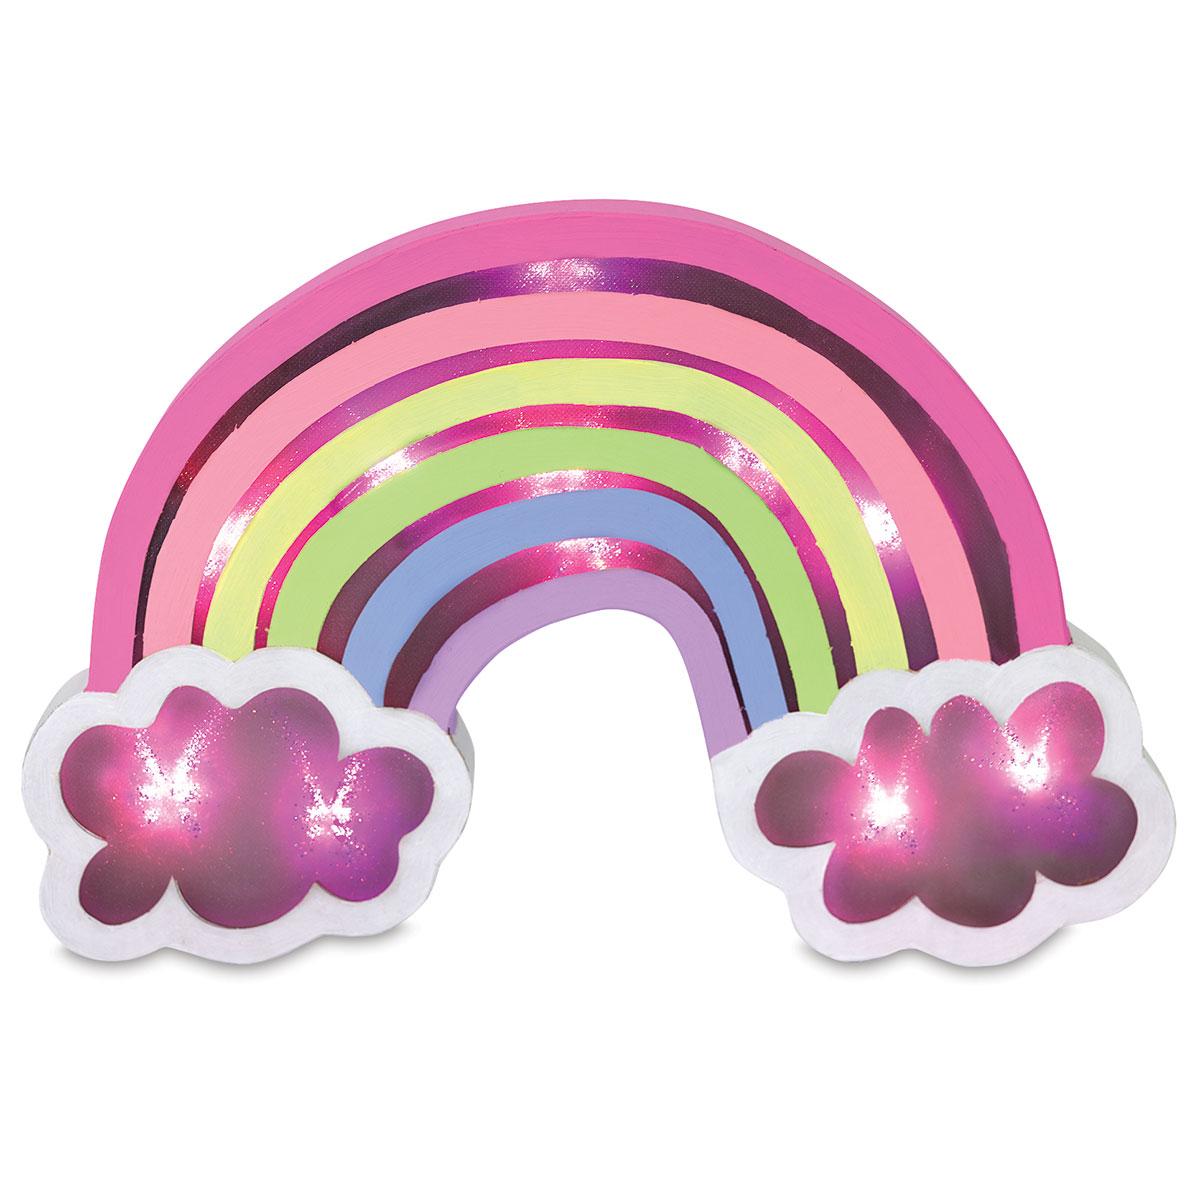 Momenta LED Lighted Papier Mache Shape - Rainbow